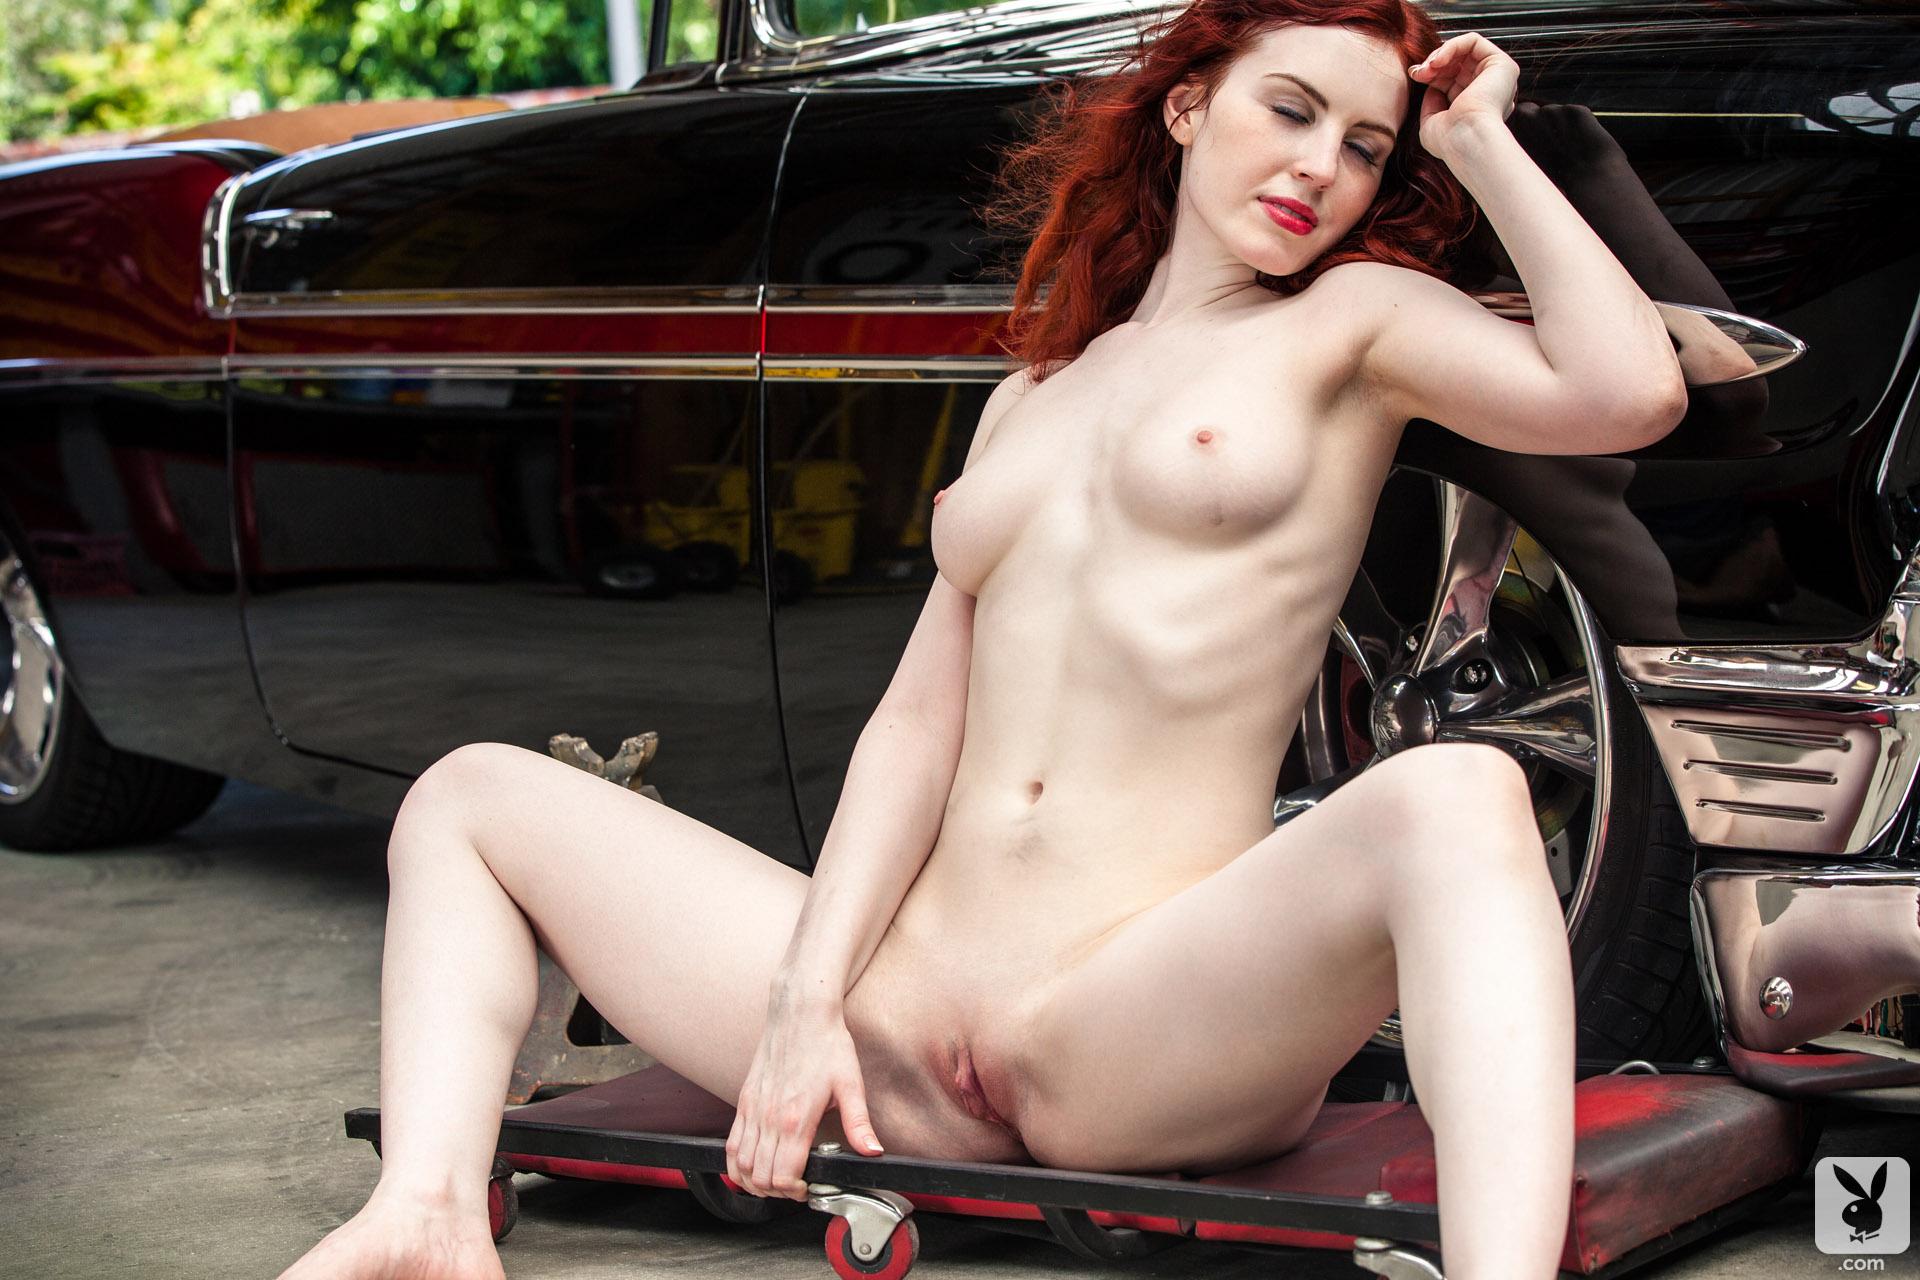 Tonie orr naked pics